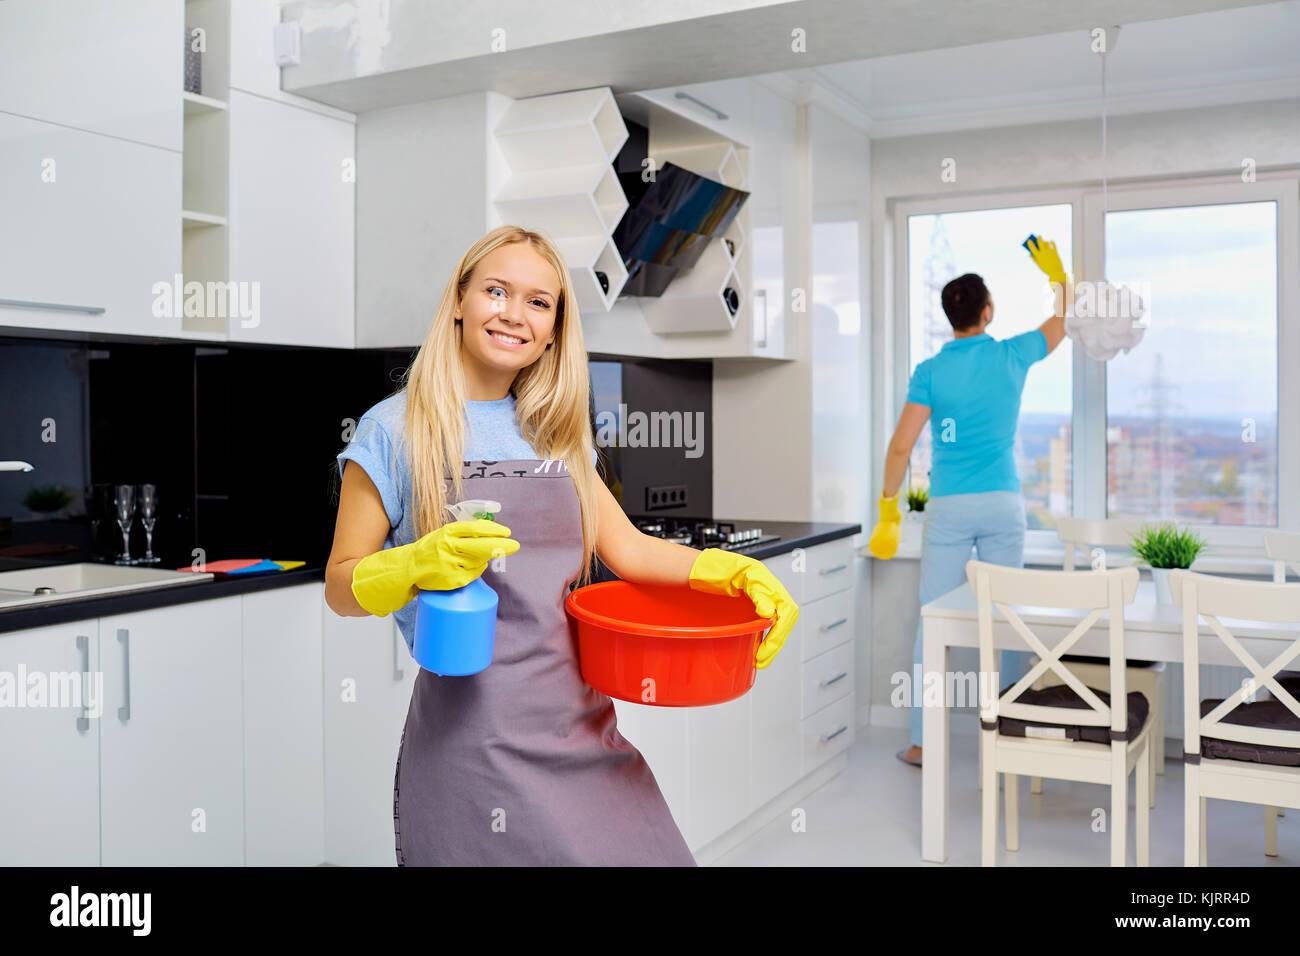 Busco pareja para que li.pie cocine [PUNIQRANDLINE-(au-dating-names.txt) 29